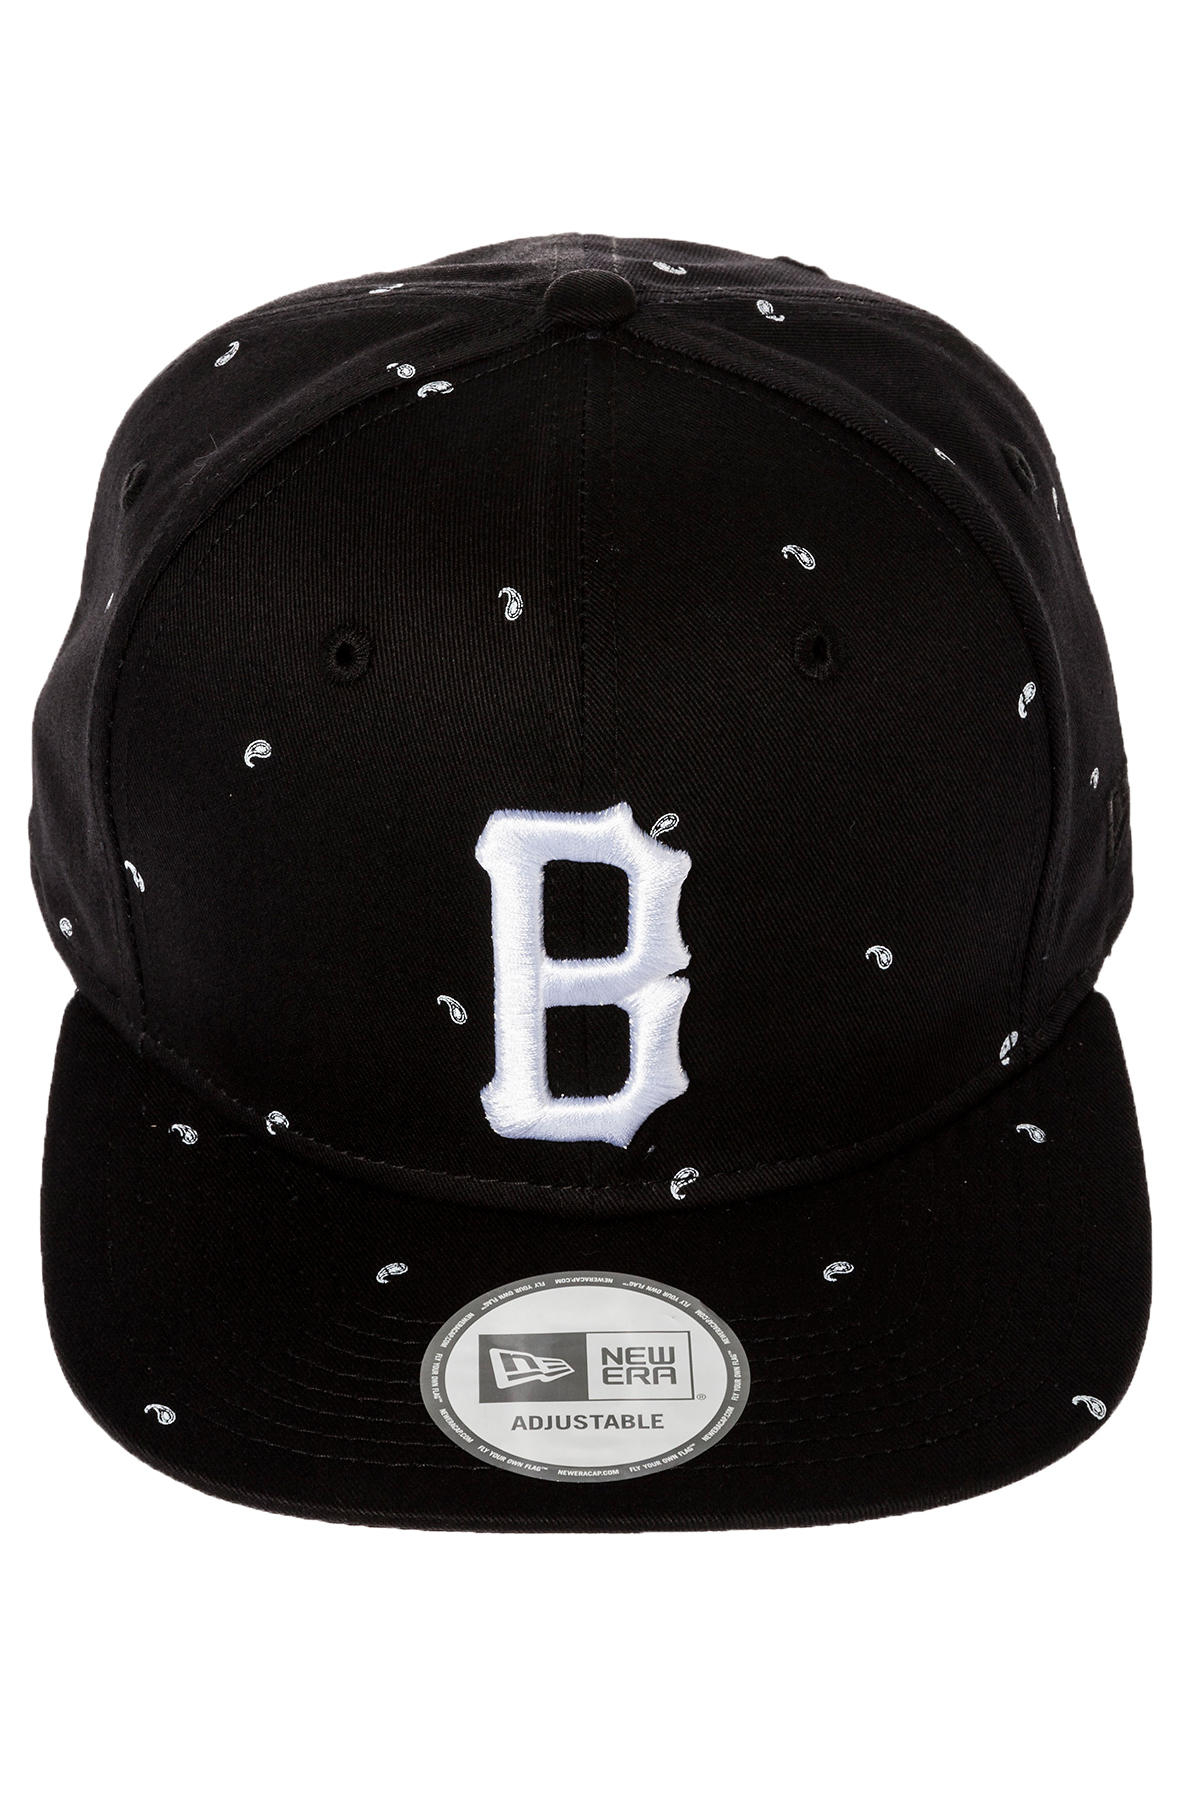 Lyst - Black Scale The Paisley B Logo Strapback Hat in Black for Men 072f076375b1